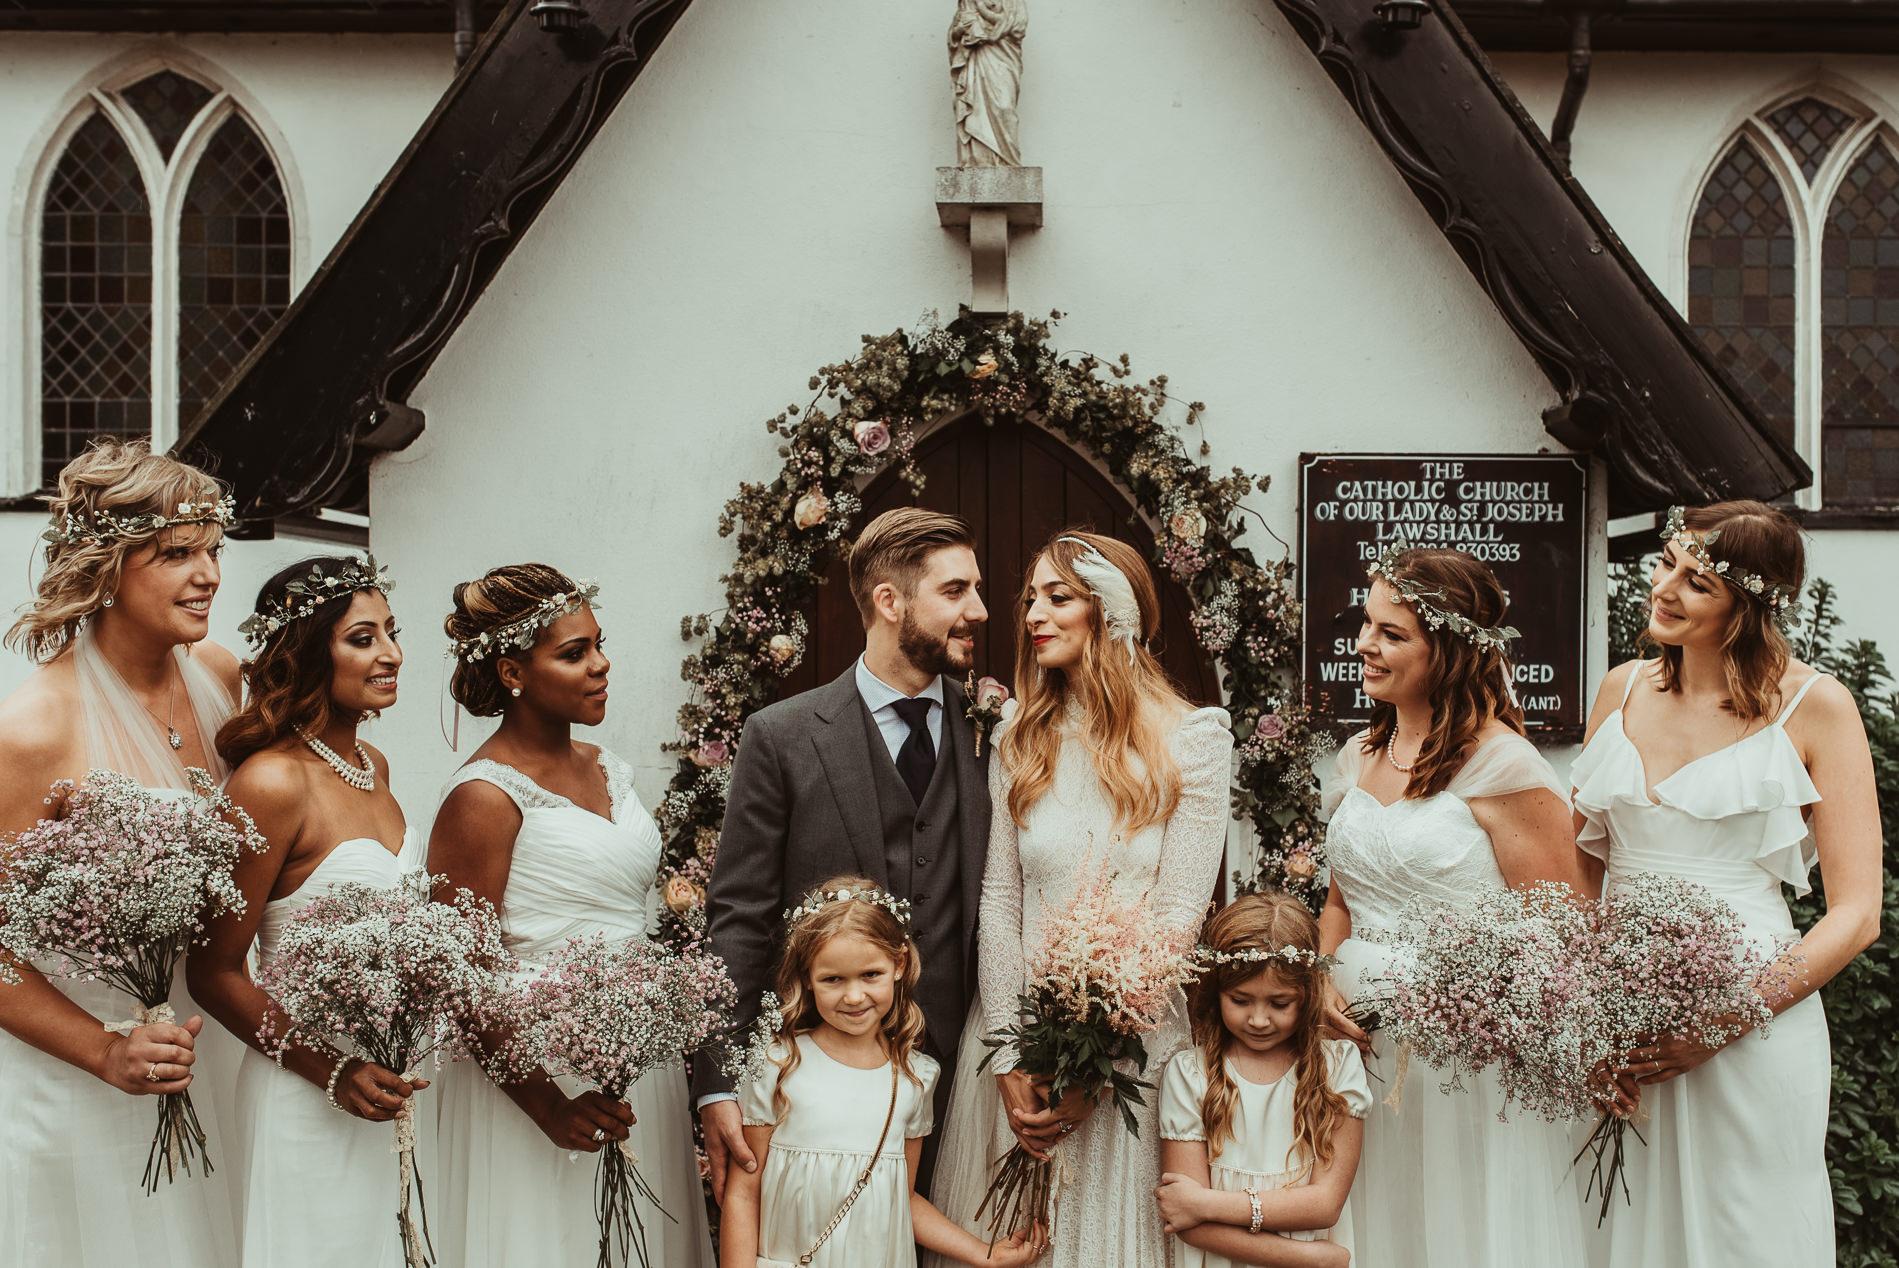 bohemian_wedding_lawshall_church_garden45